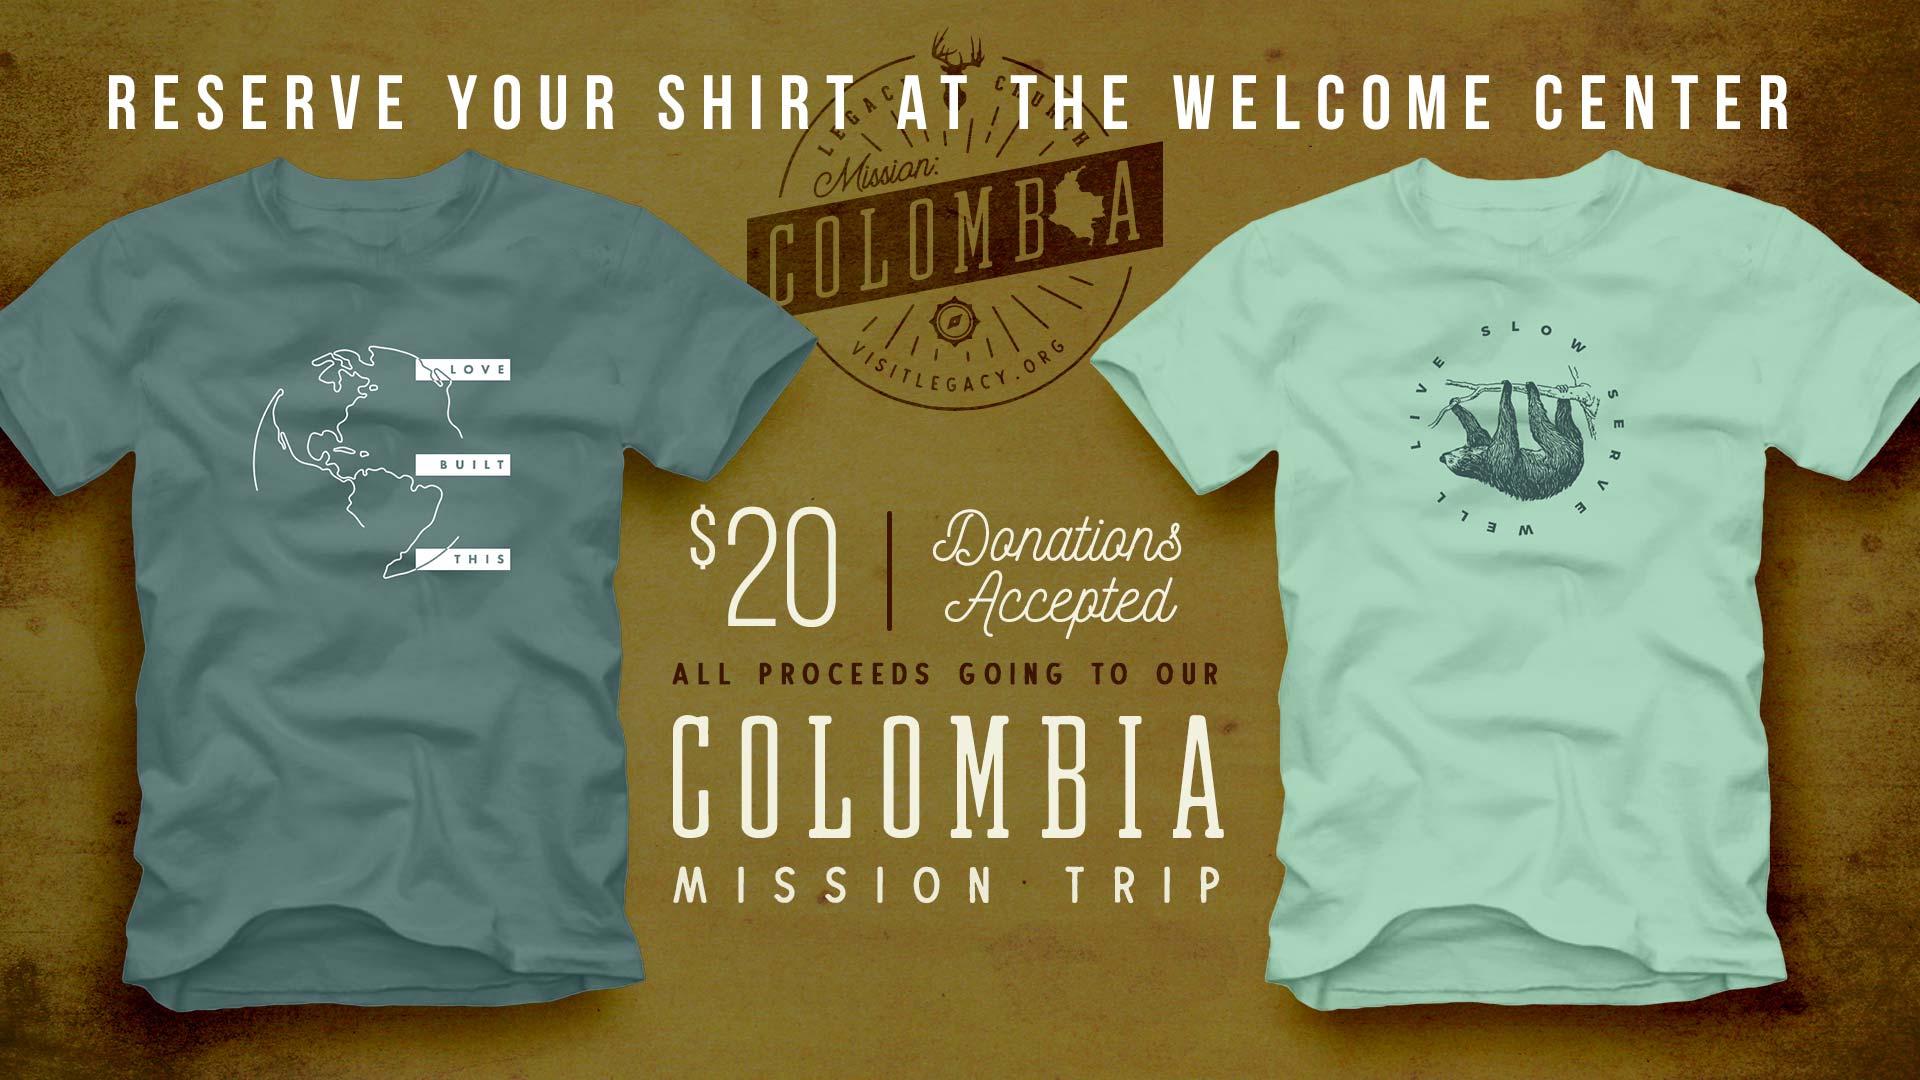 Colombia-shirt-slide2.jpg